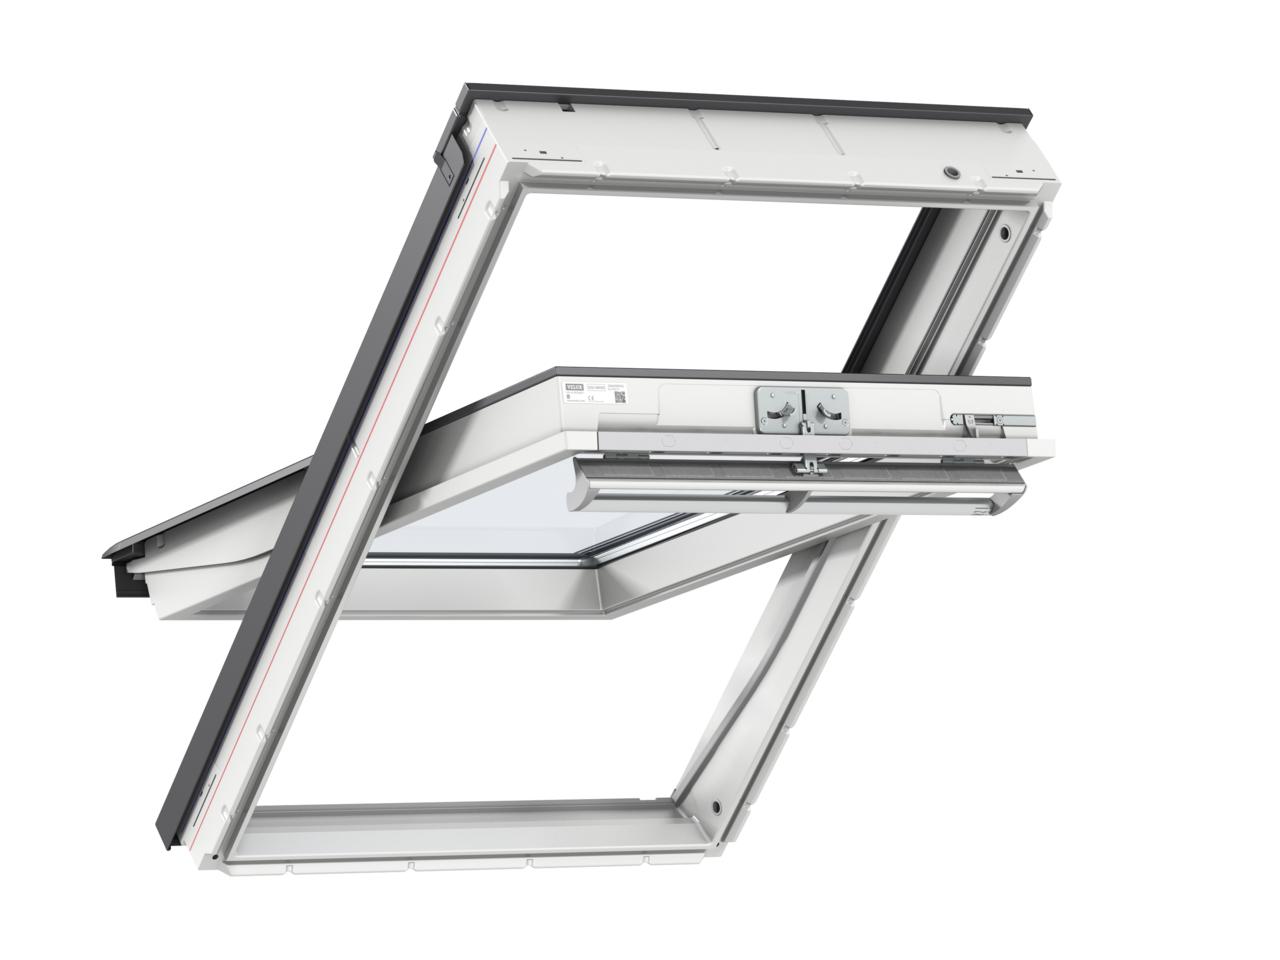 Velux GGU PK10 940 x 1600mm Centre Pivot 34Pane Roof Window - White Polyurethane